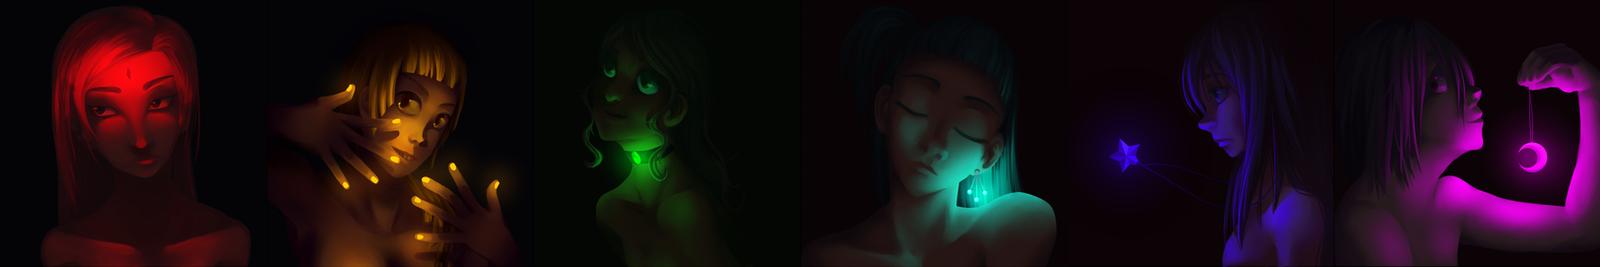 Inner Glow by nomyriad